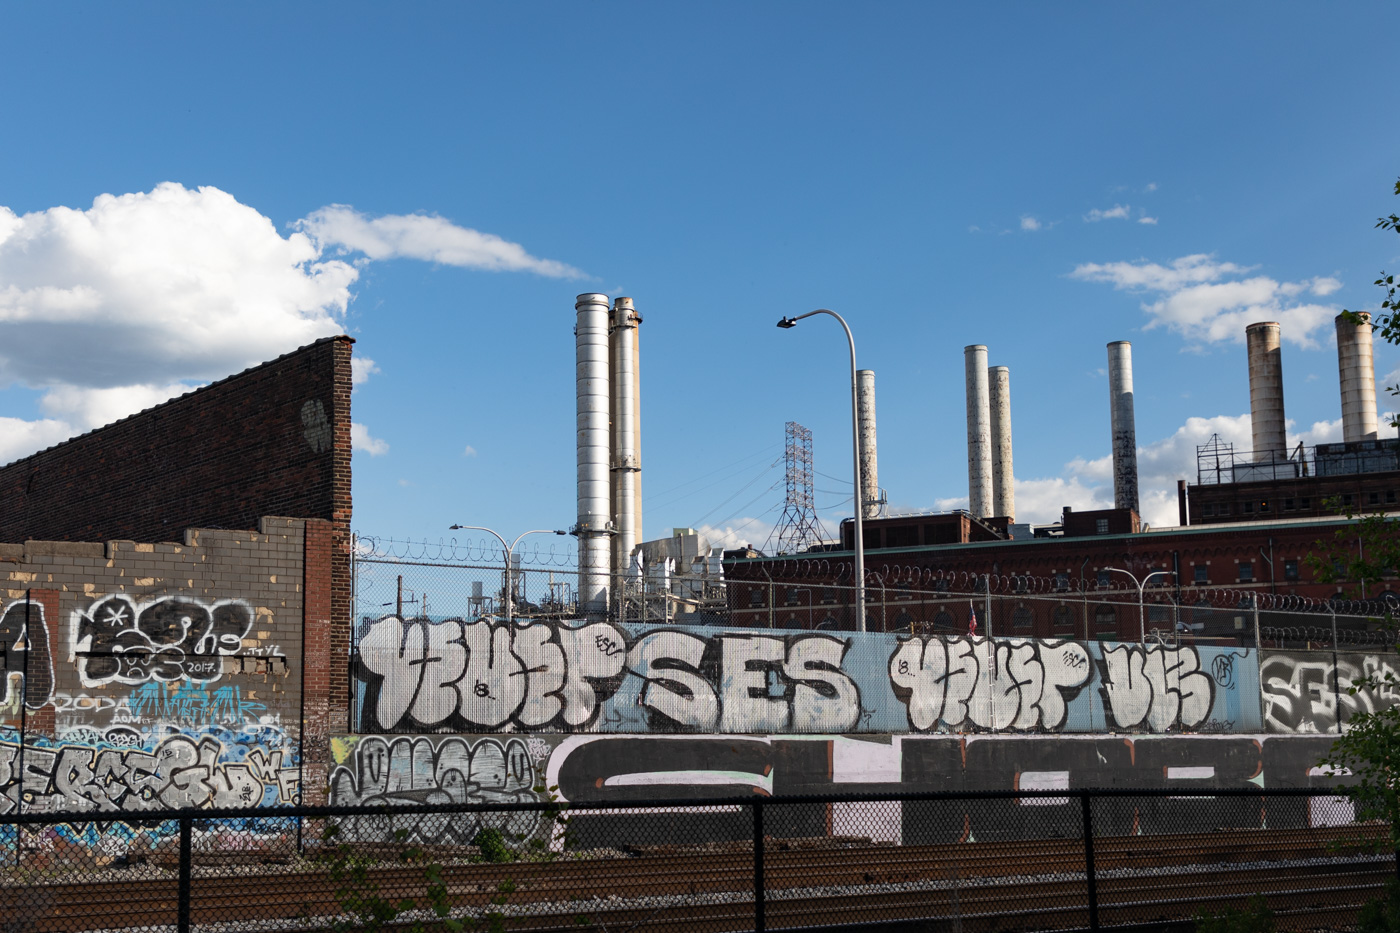 Graffiti and Factory